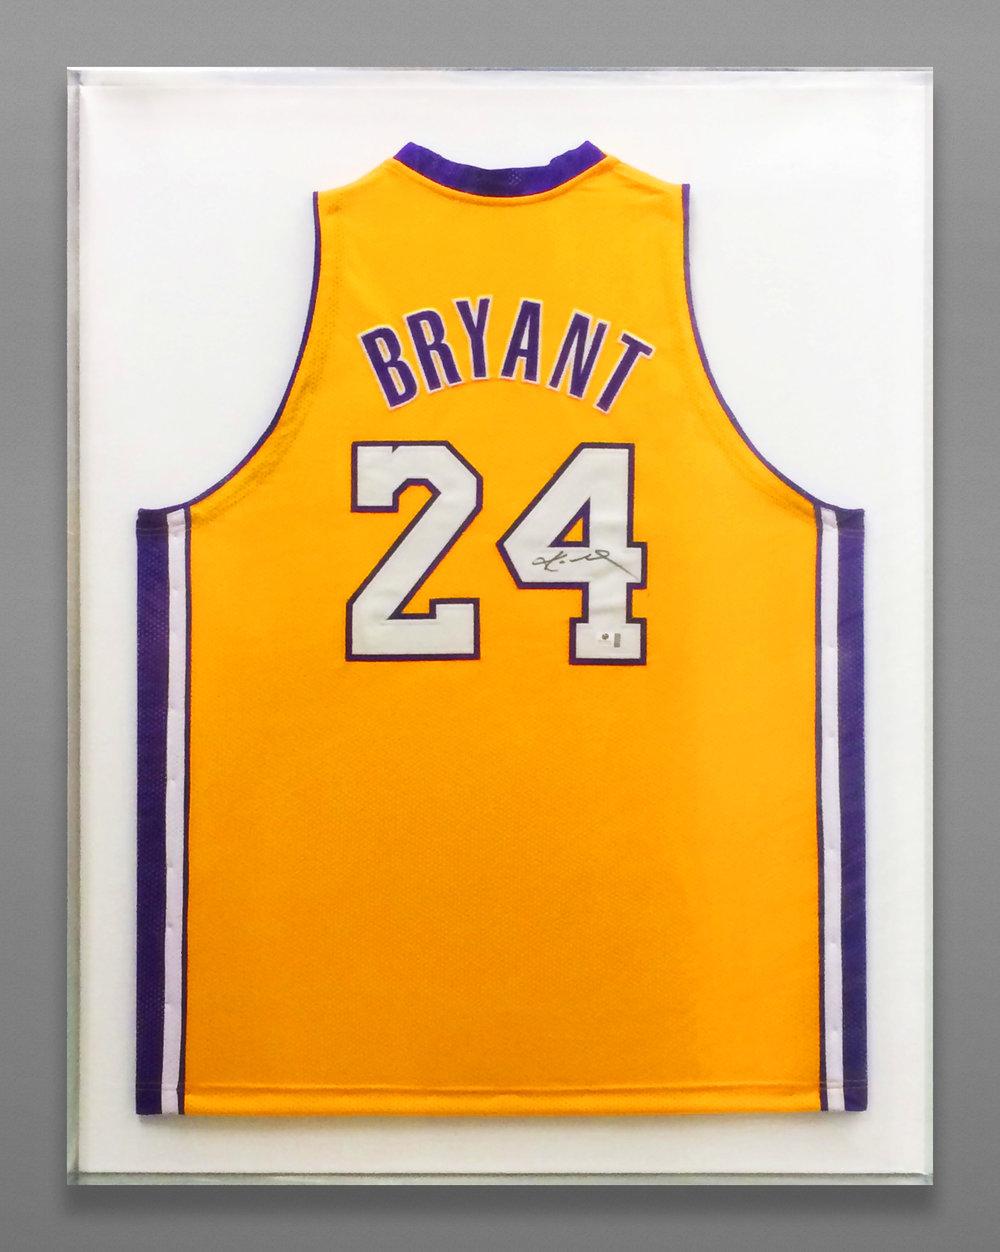 kobe-bryant-jersey-signed-memorabilia-framed-peters-gallery-orange-county-newport-beach-irvine-los-angeles-costa-mesa.jpg